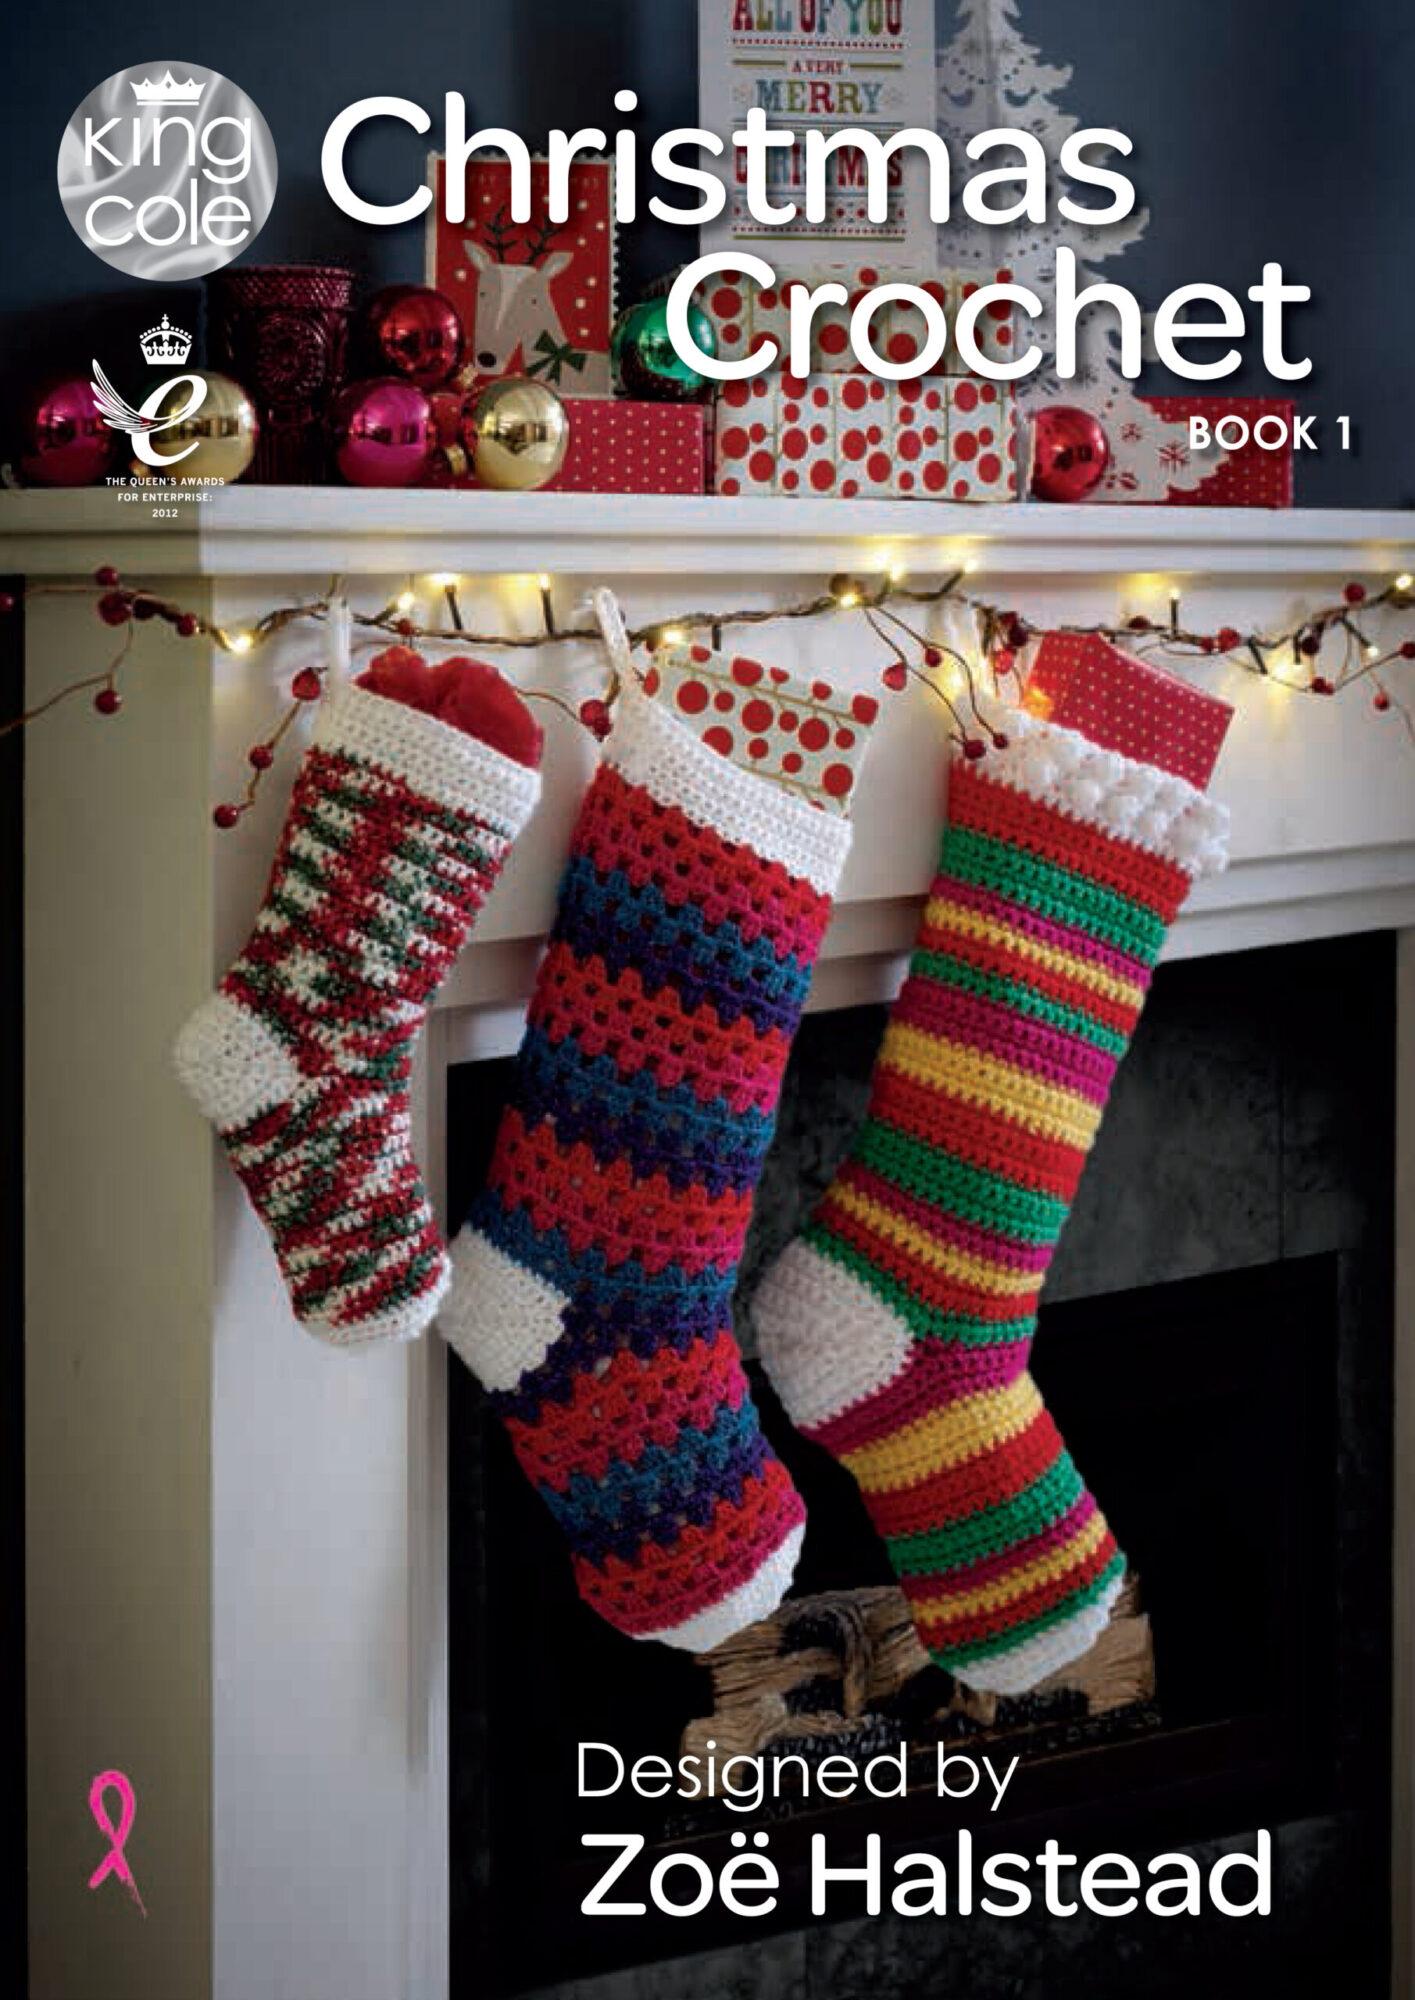 King Cole Christmas Crochet – Book 1 product image